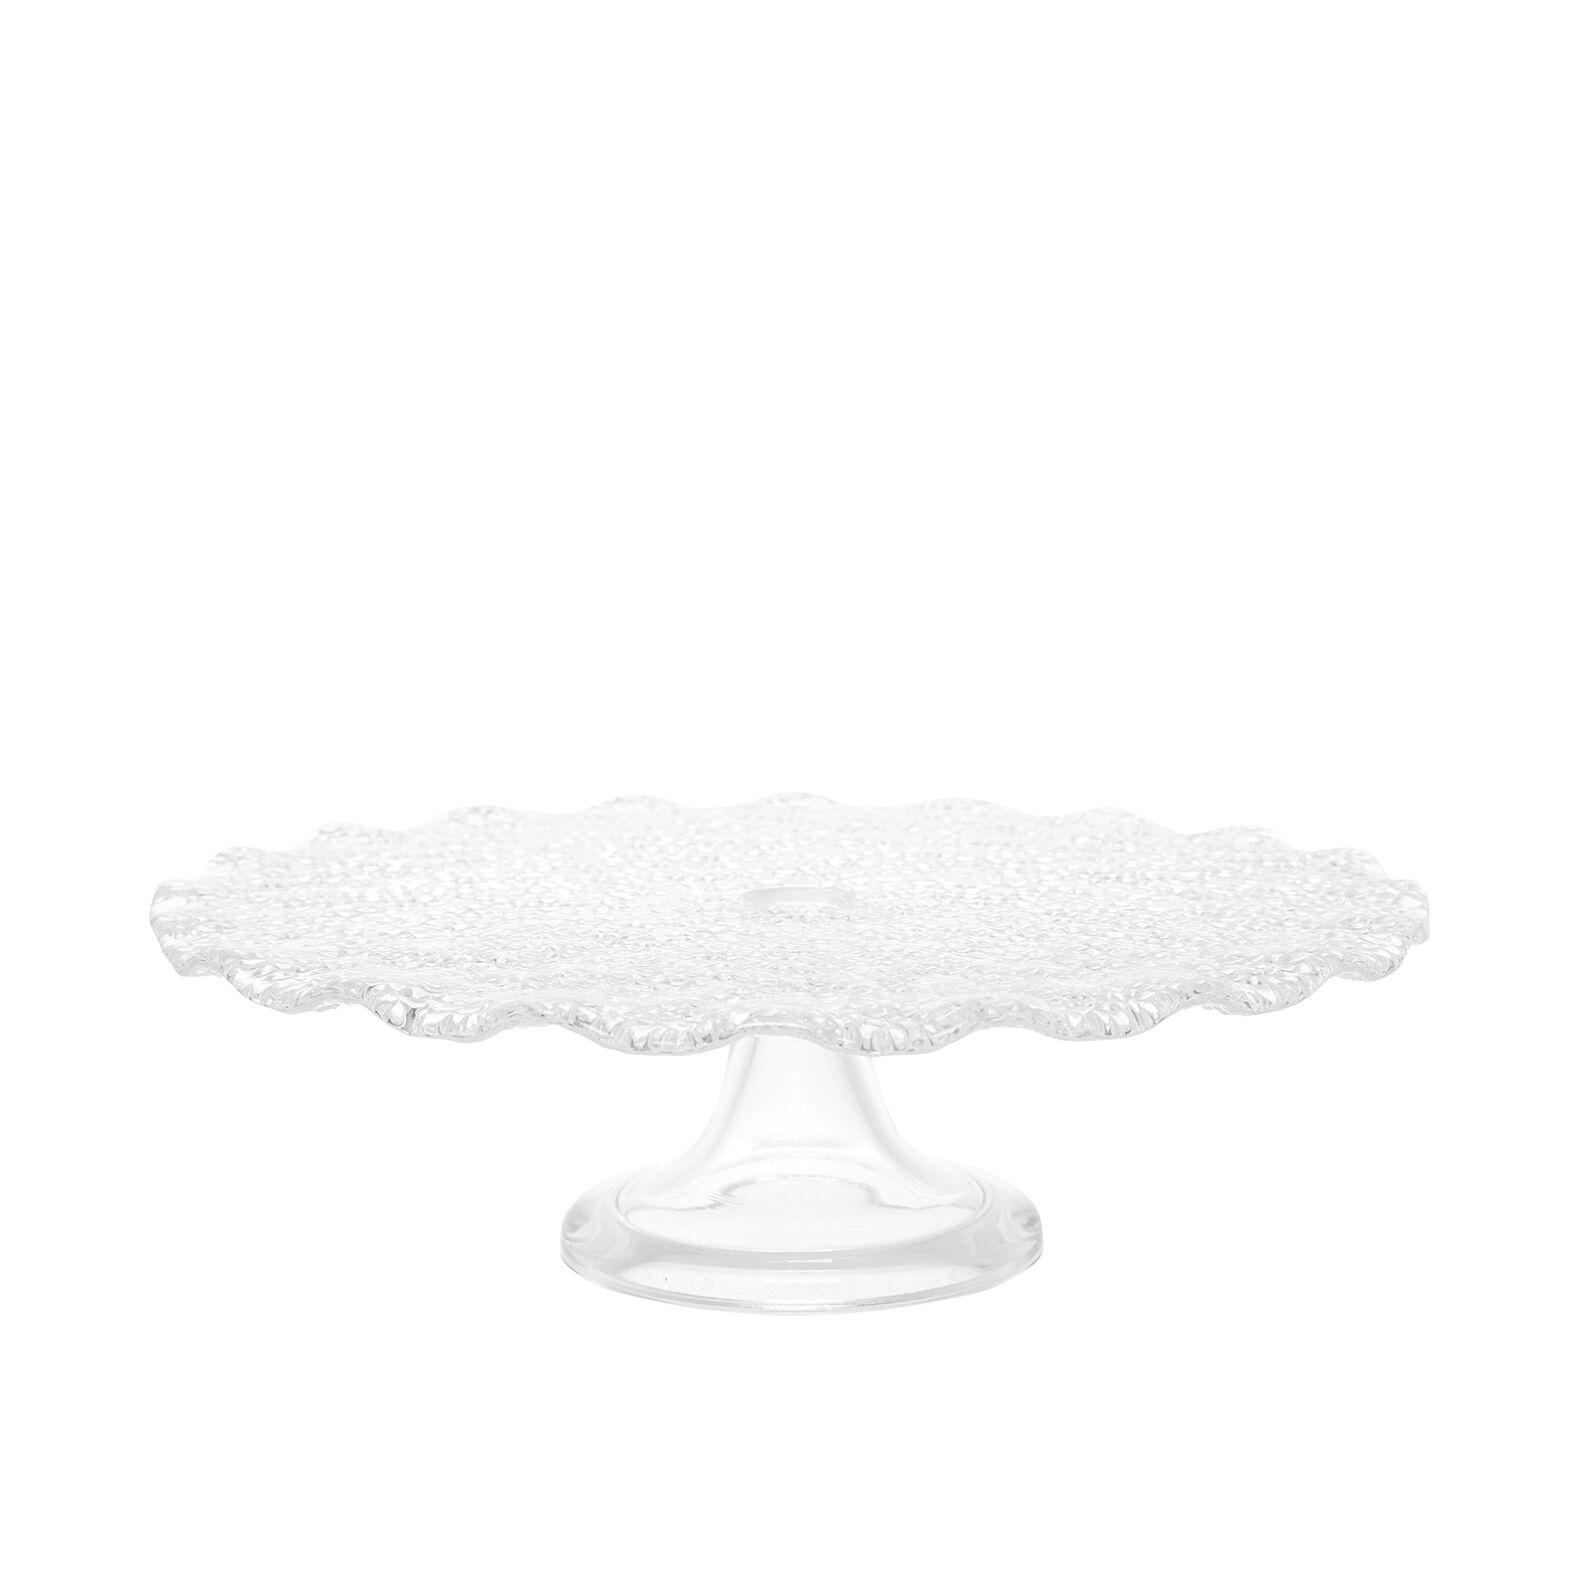 Lvv scalloped glass cake stand